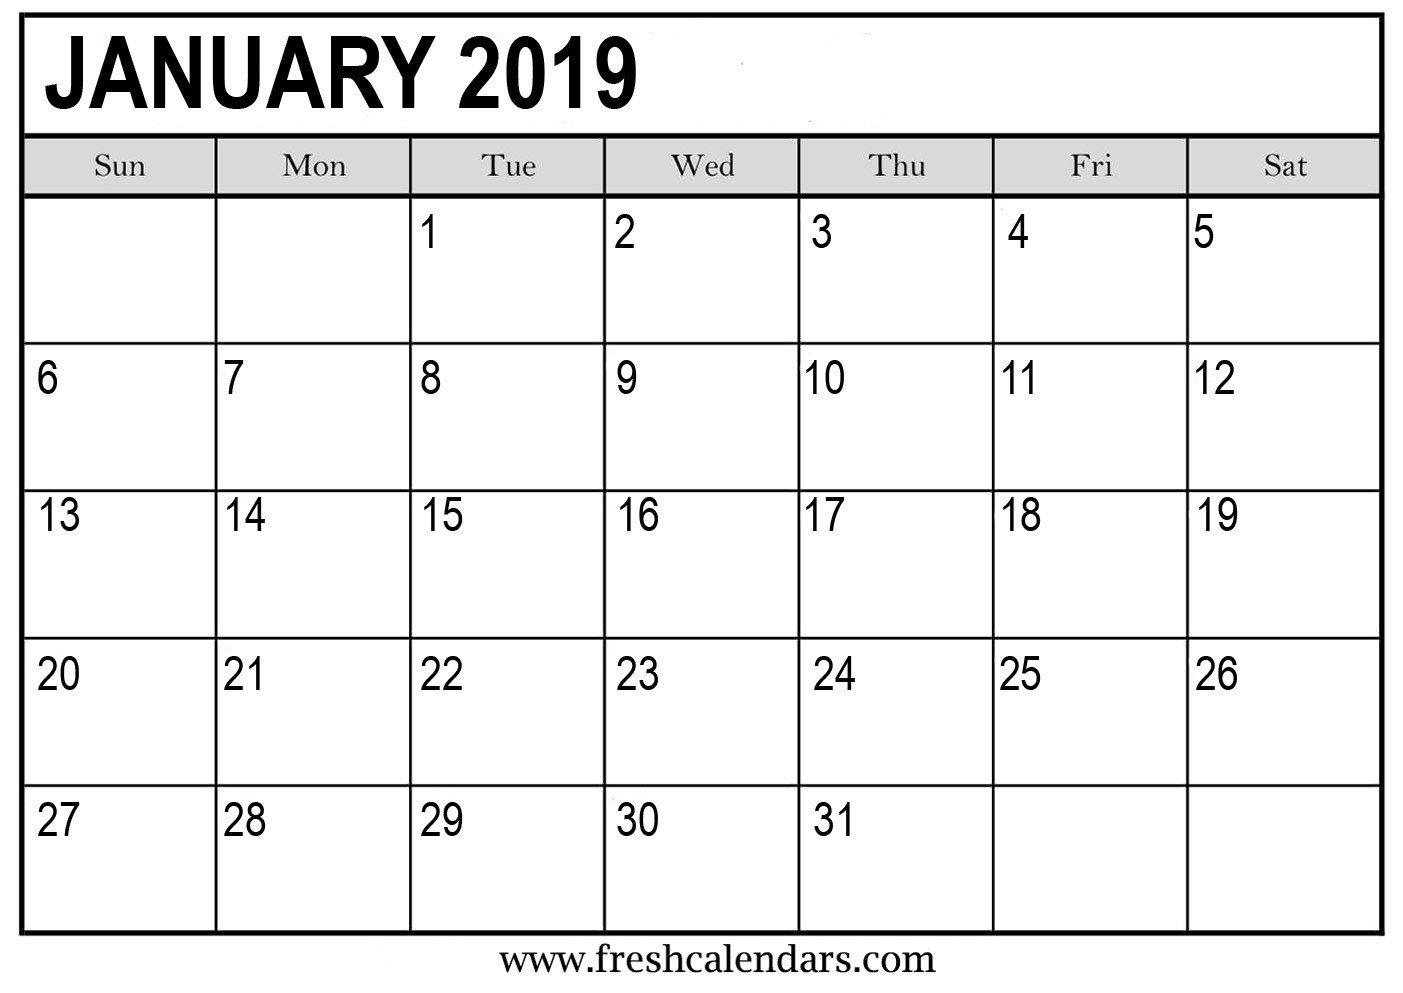 Blank Calendar Template Word January 2019 Calendar Printable Fresh Calendars